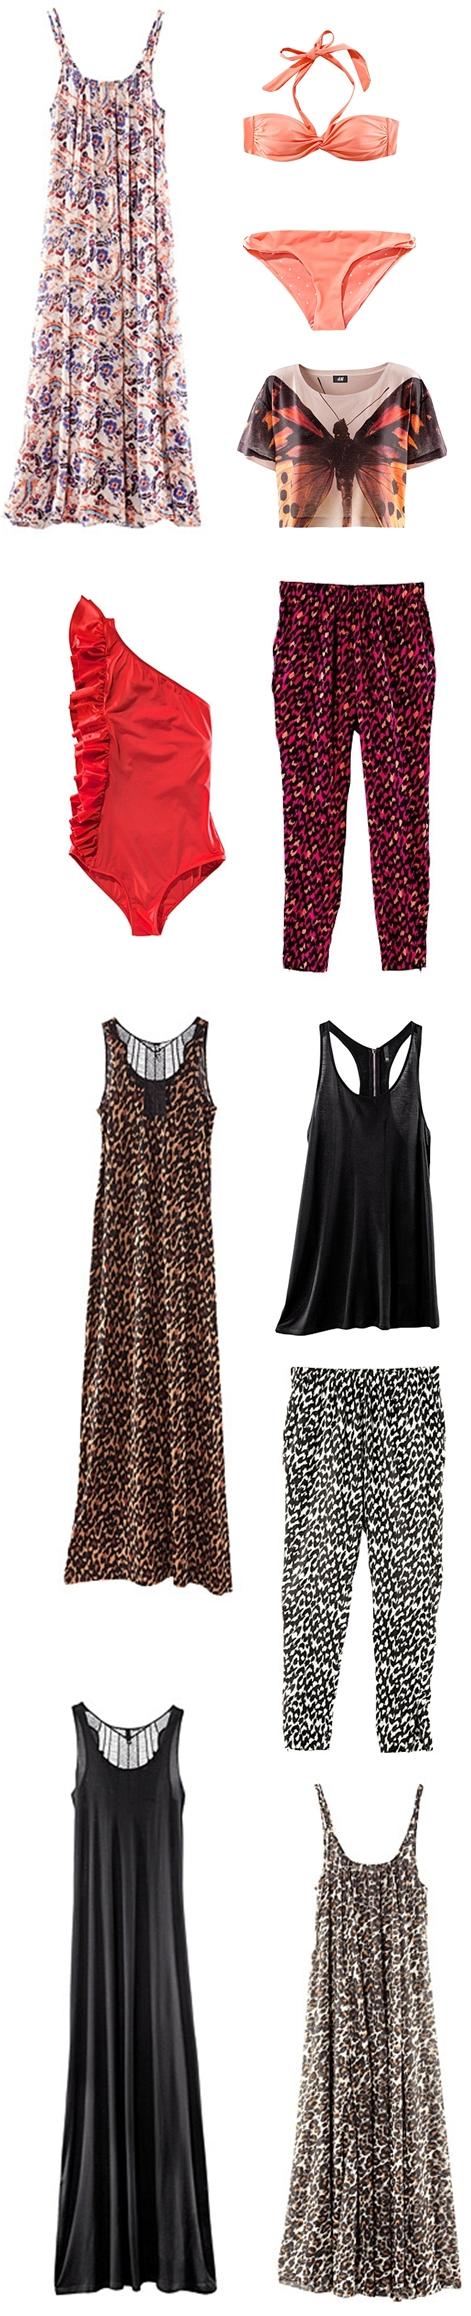 nyt H&M 2011, rød badedragt H&M, red swimsuit H&M, koral bikini, coral bikini, leopard bukser H&M, leopard pants hm, leopard maxikjole H&M, leopard maxi dress H&M